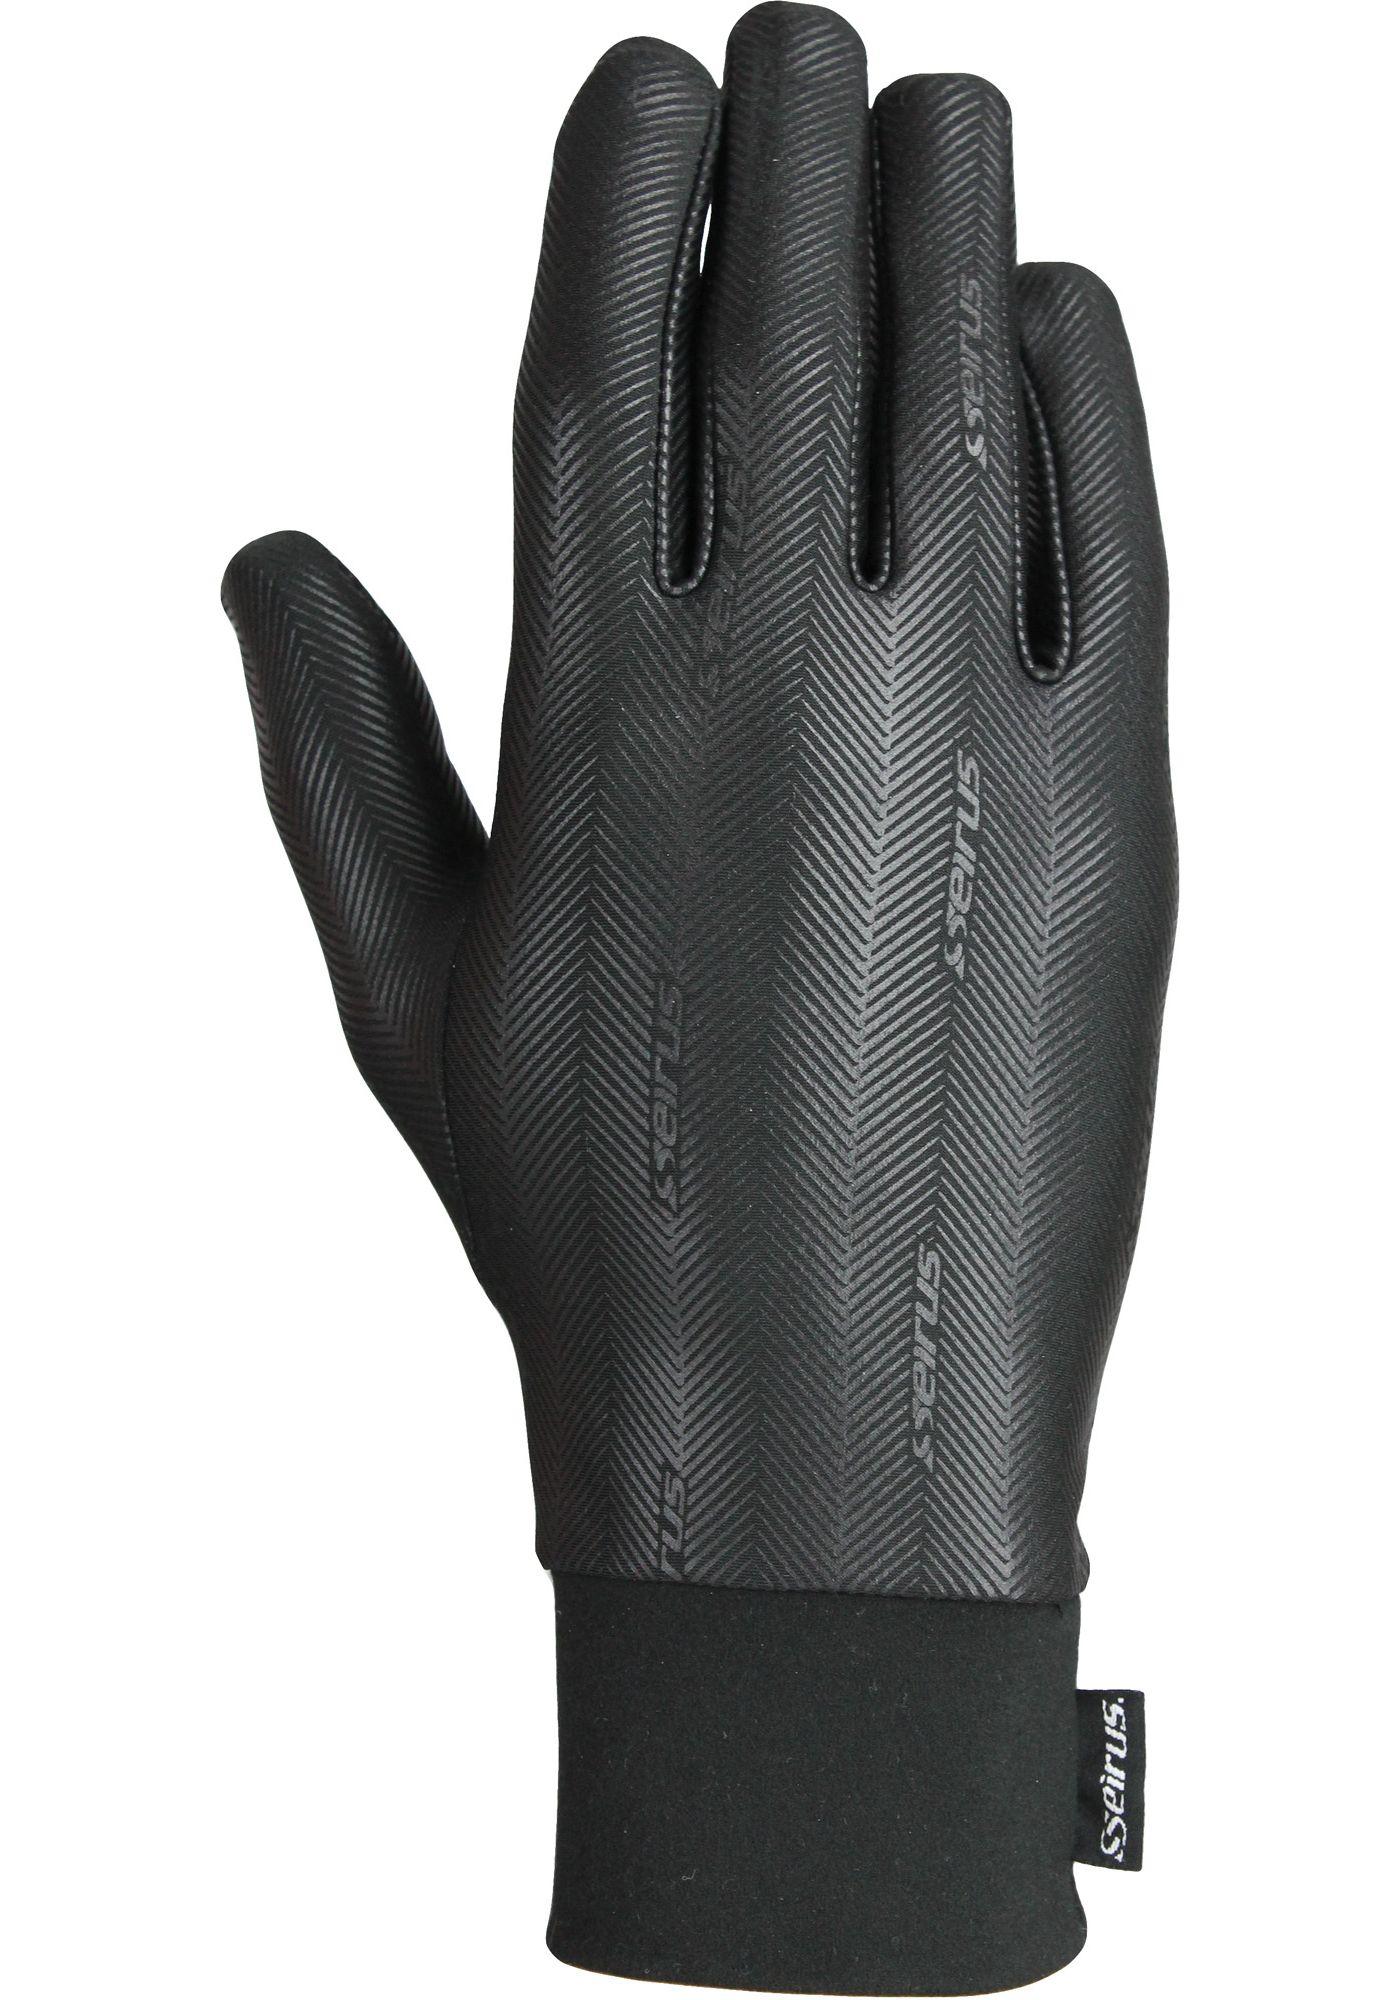 Seirus Adult Heatwave Liner Gloves